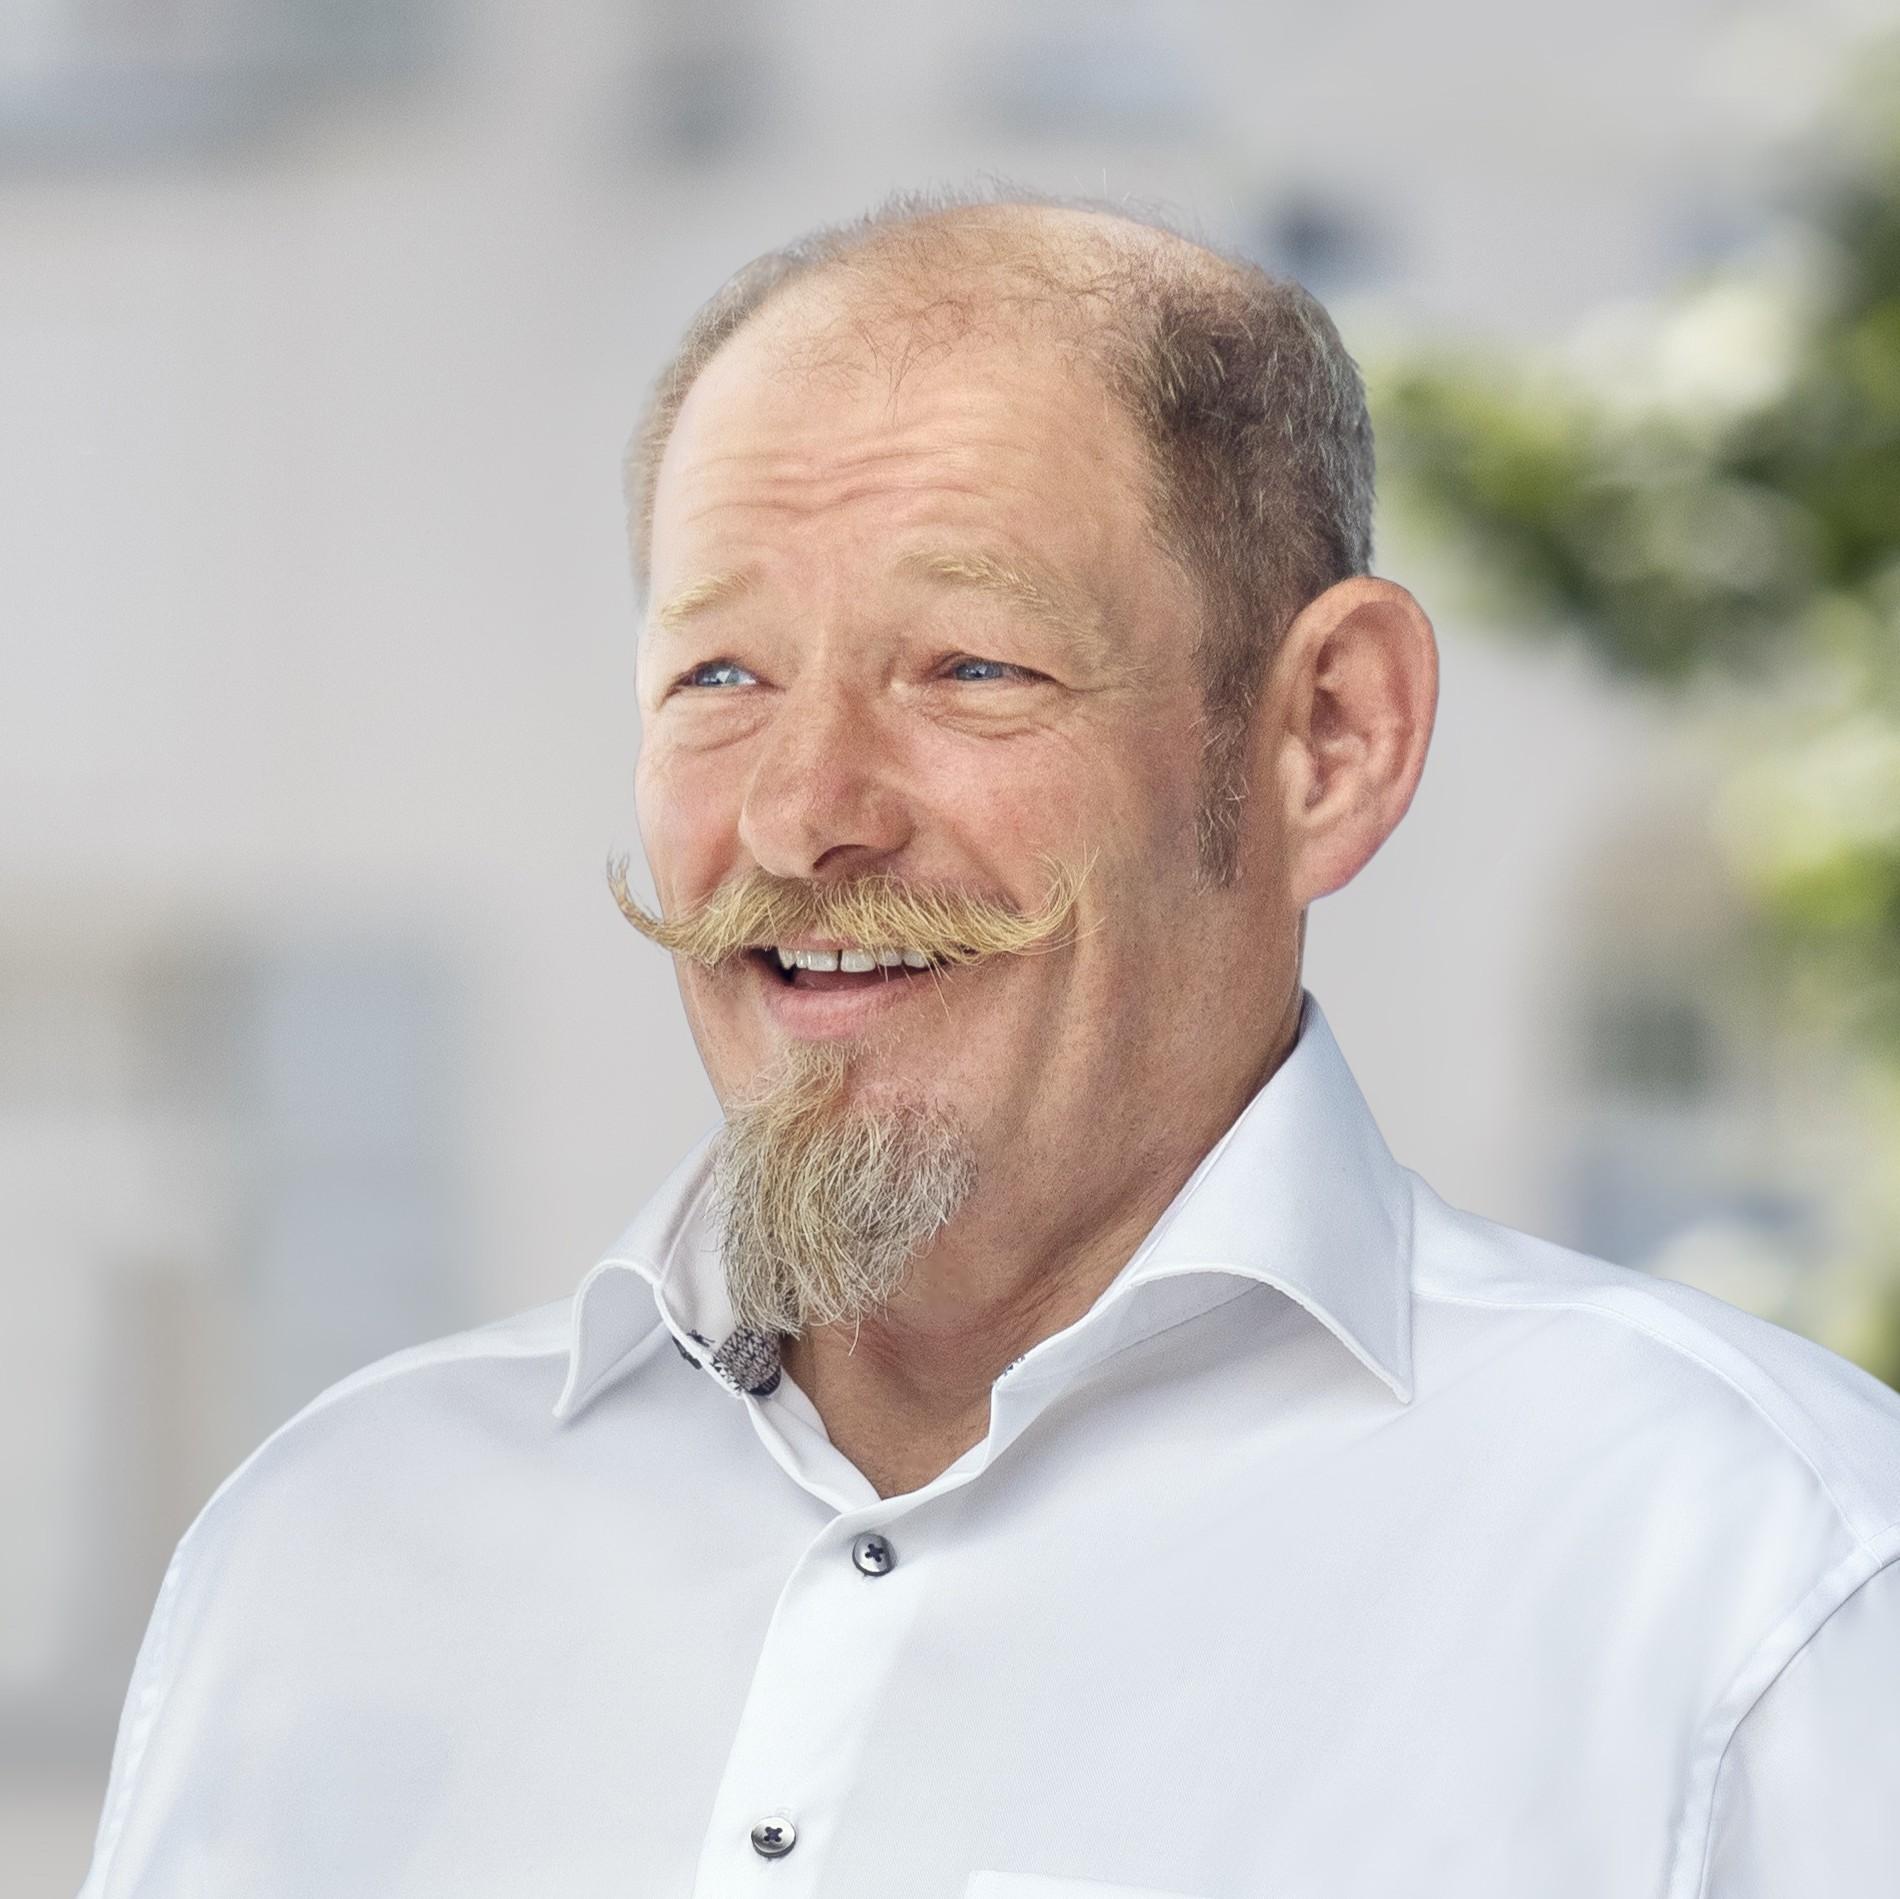 Foto: Wolfgang  Fässler